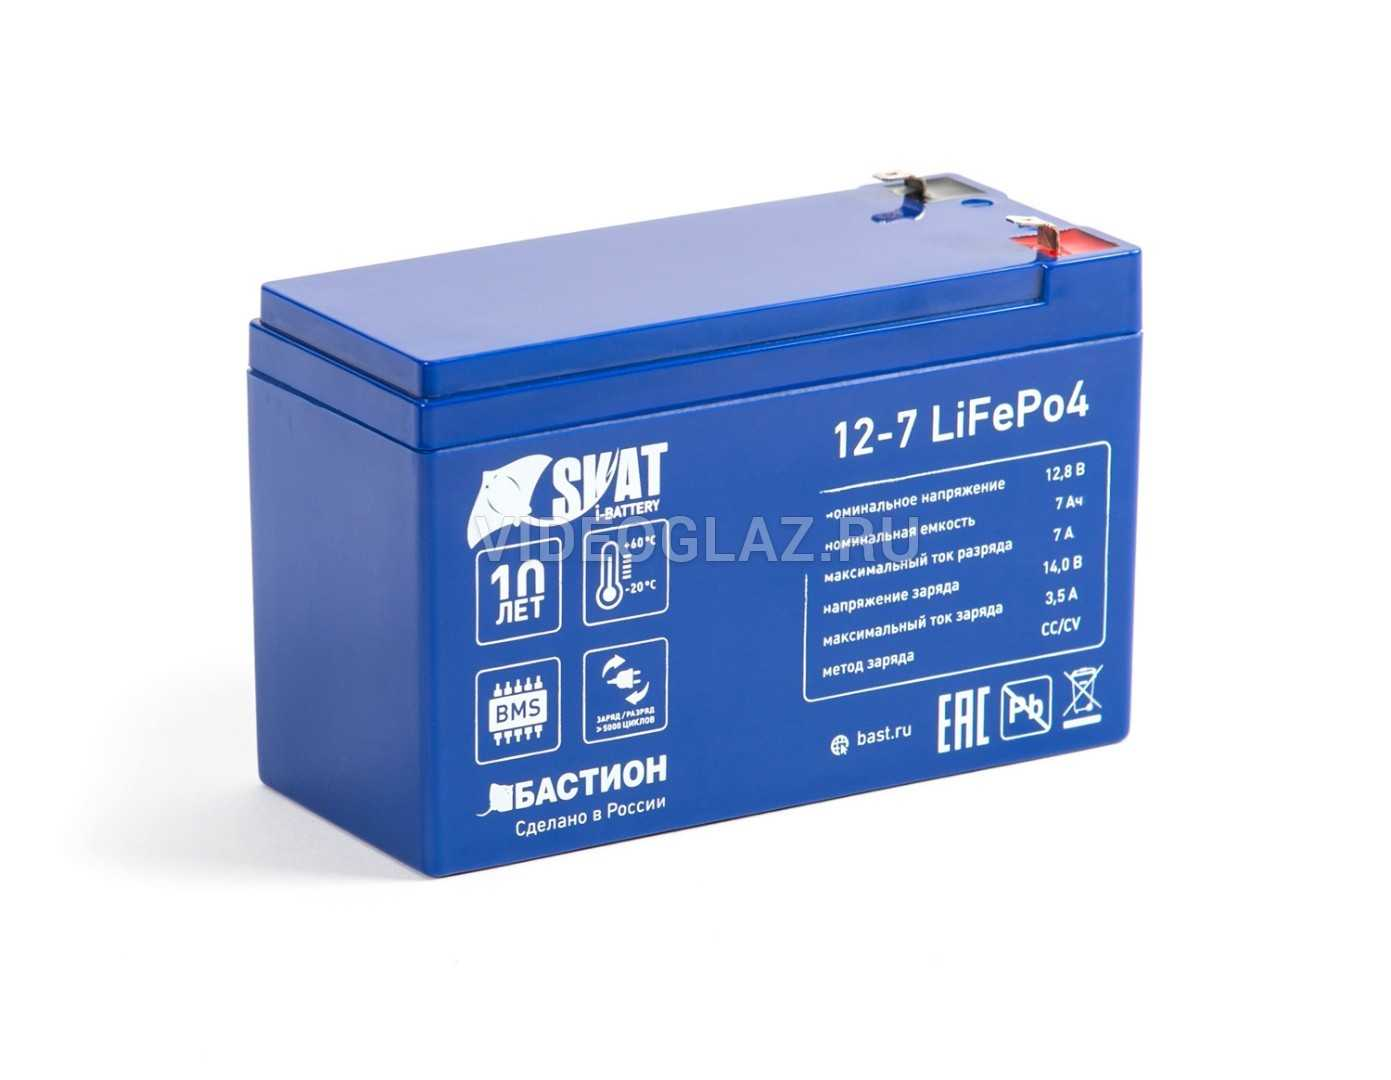 СКАТ Skat i-Battery 12-7 LiFePo4